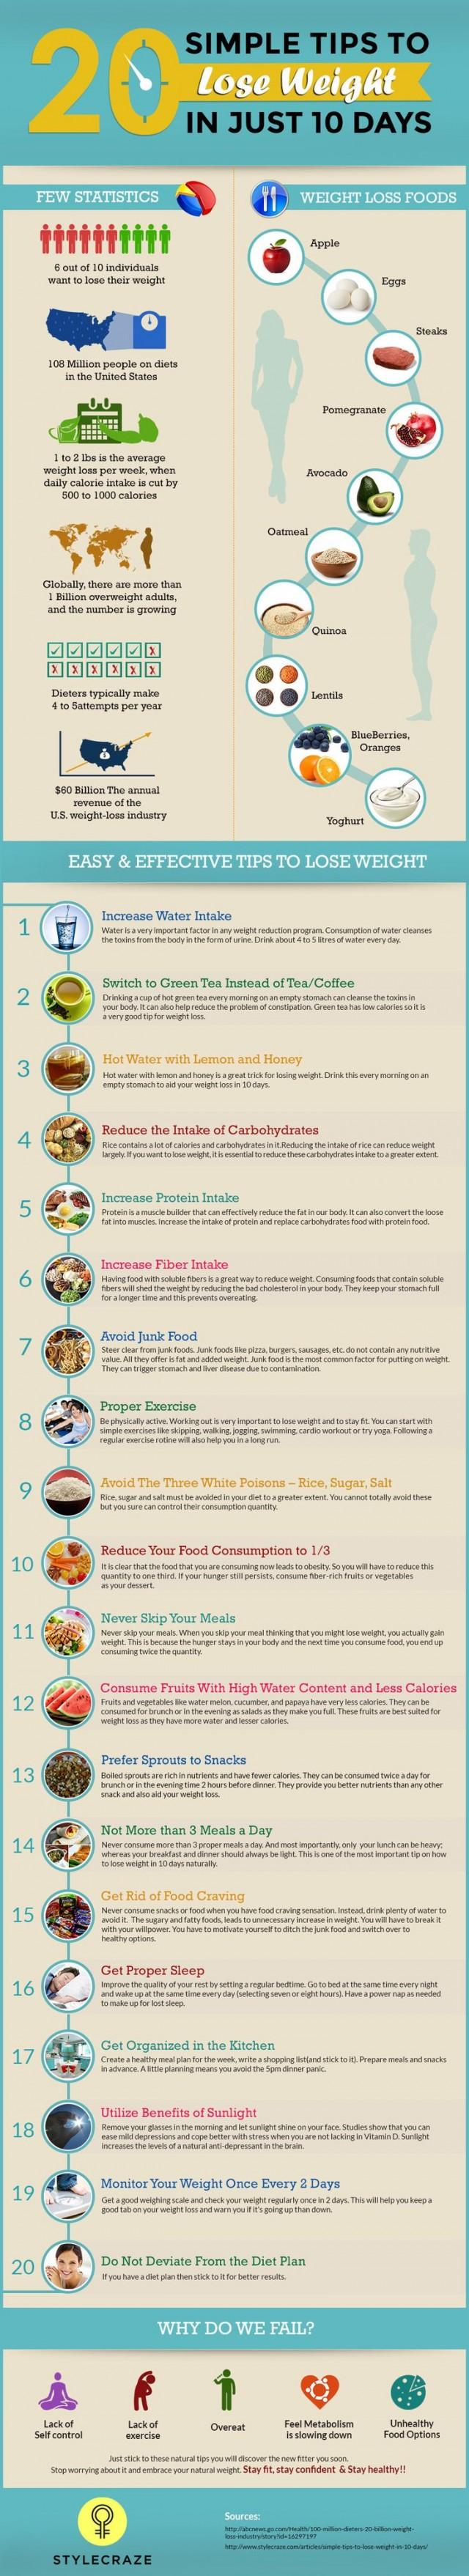 diet to lose weight in 10 days photo - 1